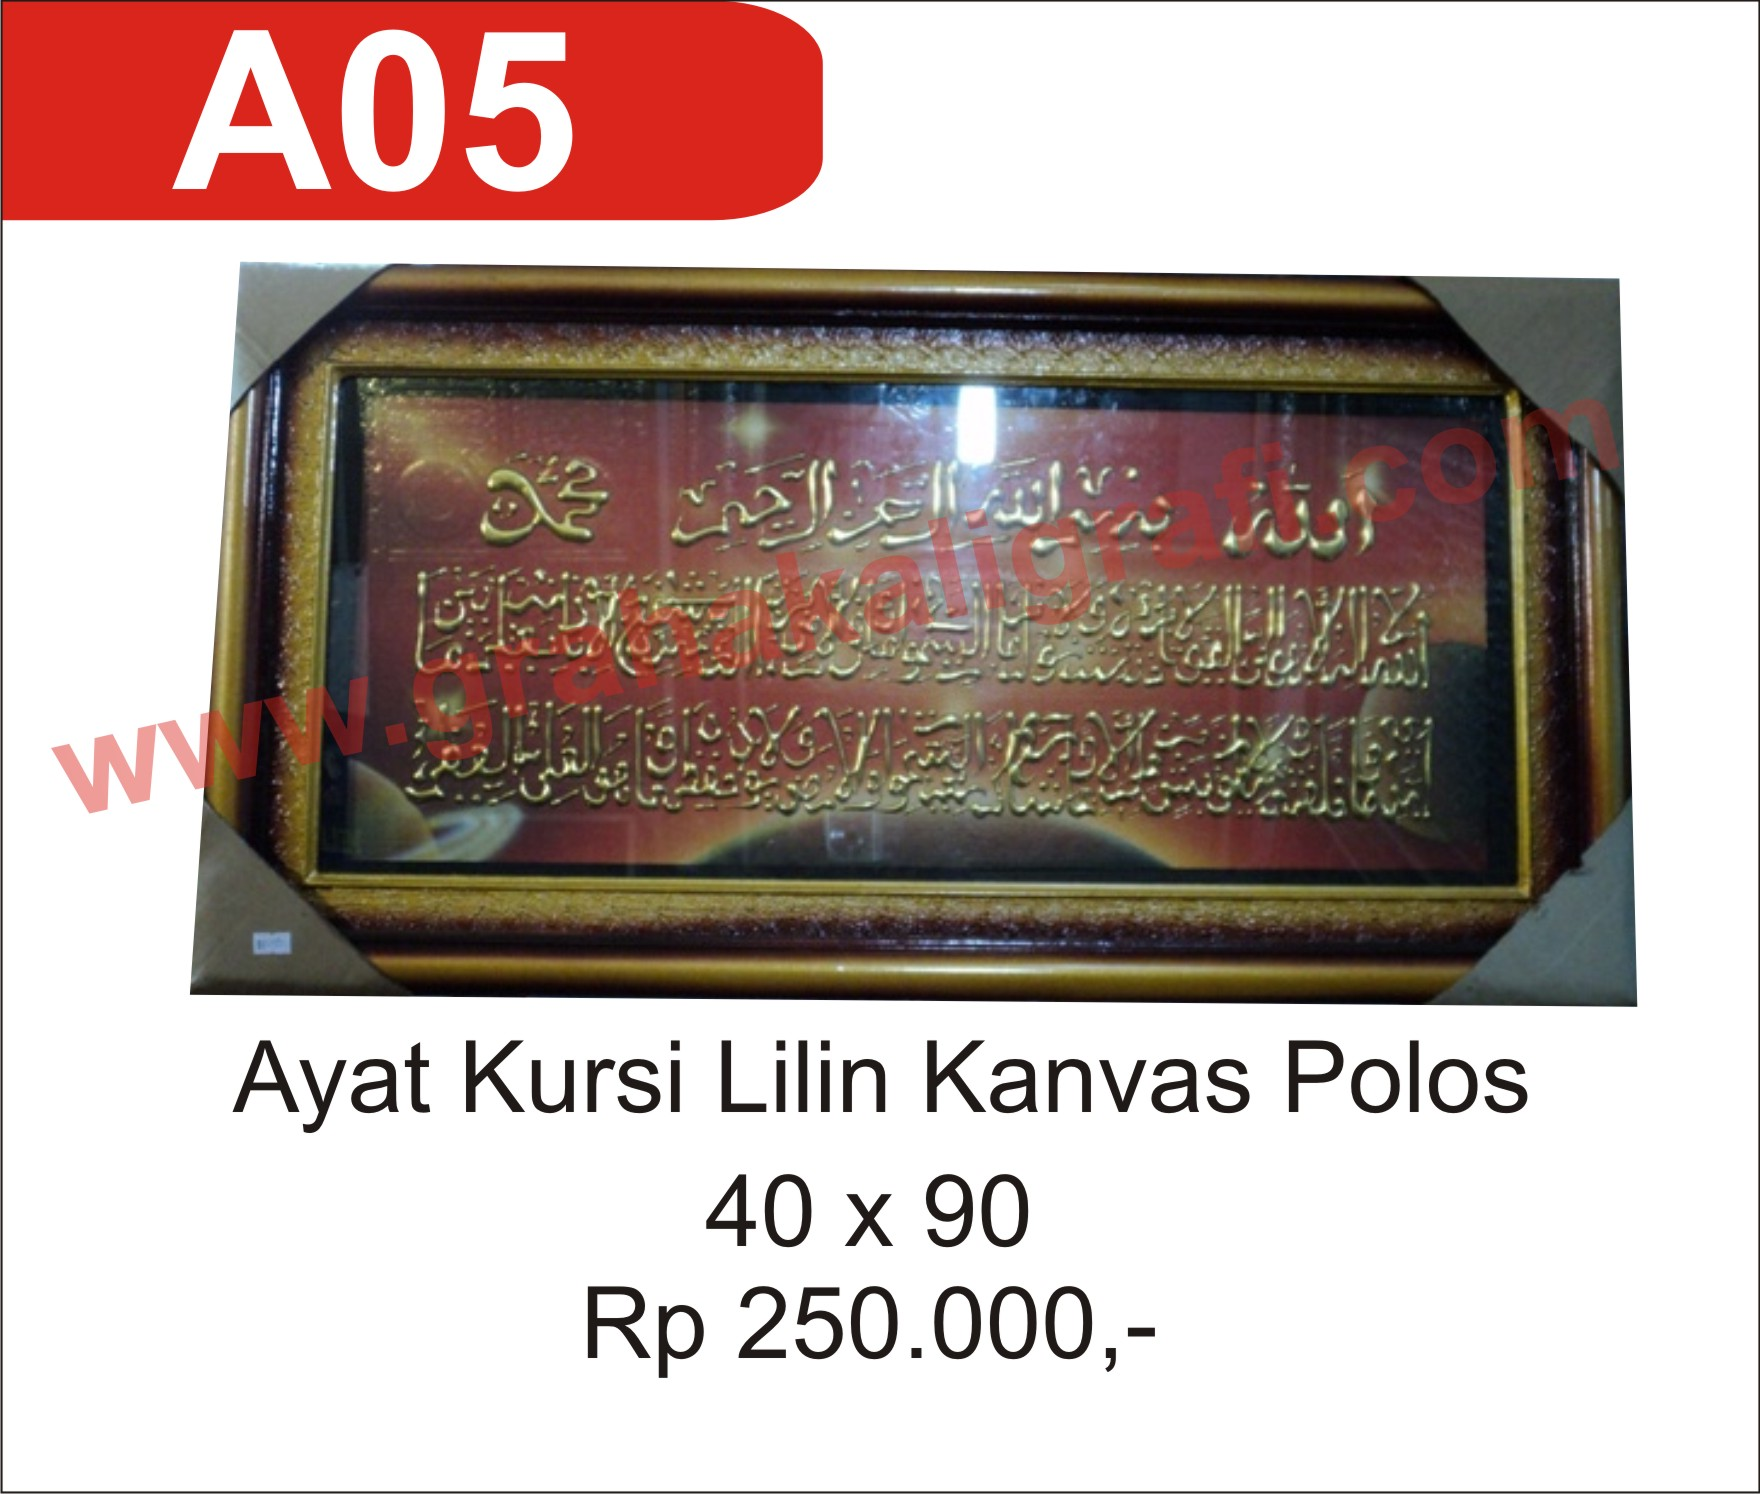 ... polos-graha-kaligrafi-e28093-kaligrafi-islam-e28093-kaligrafi-arab.jpg